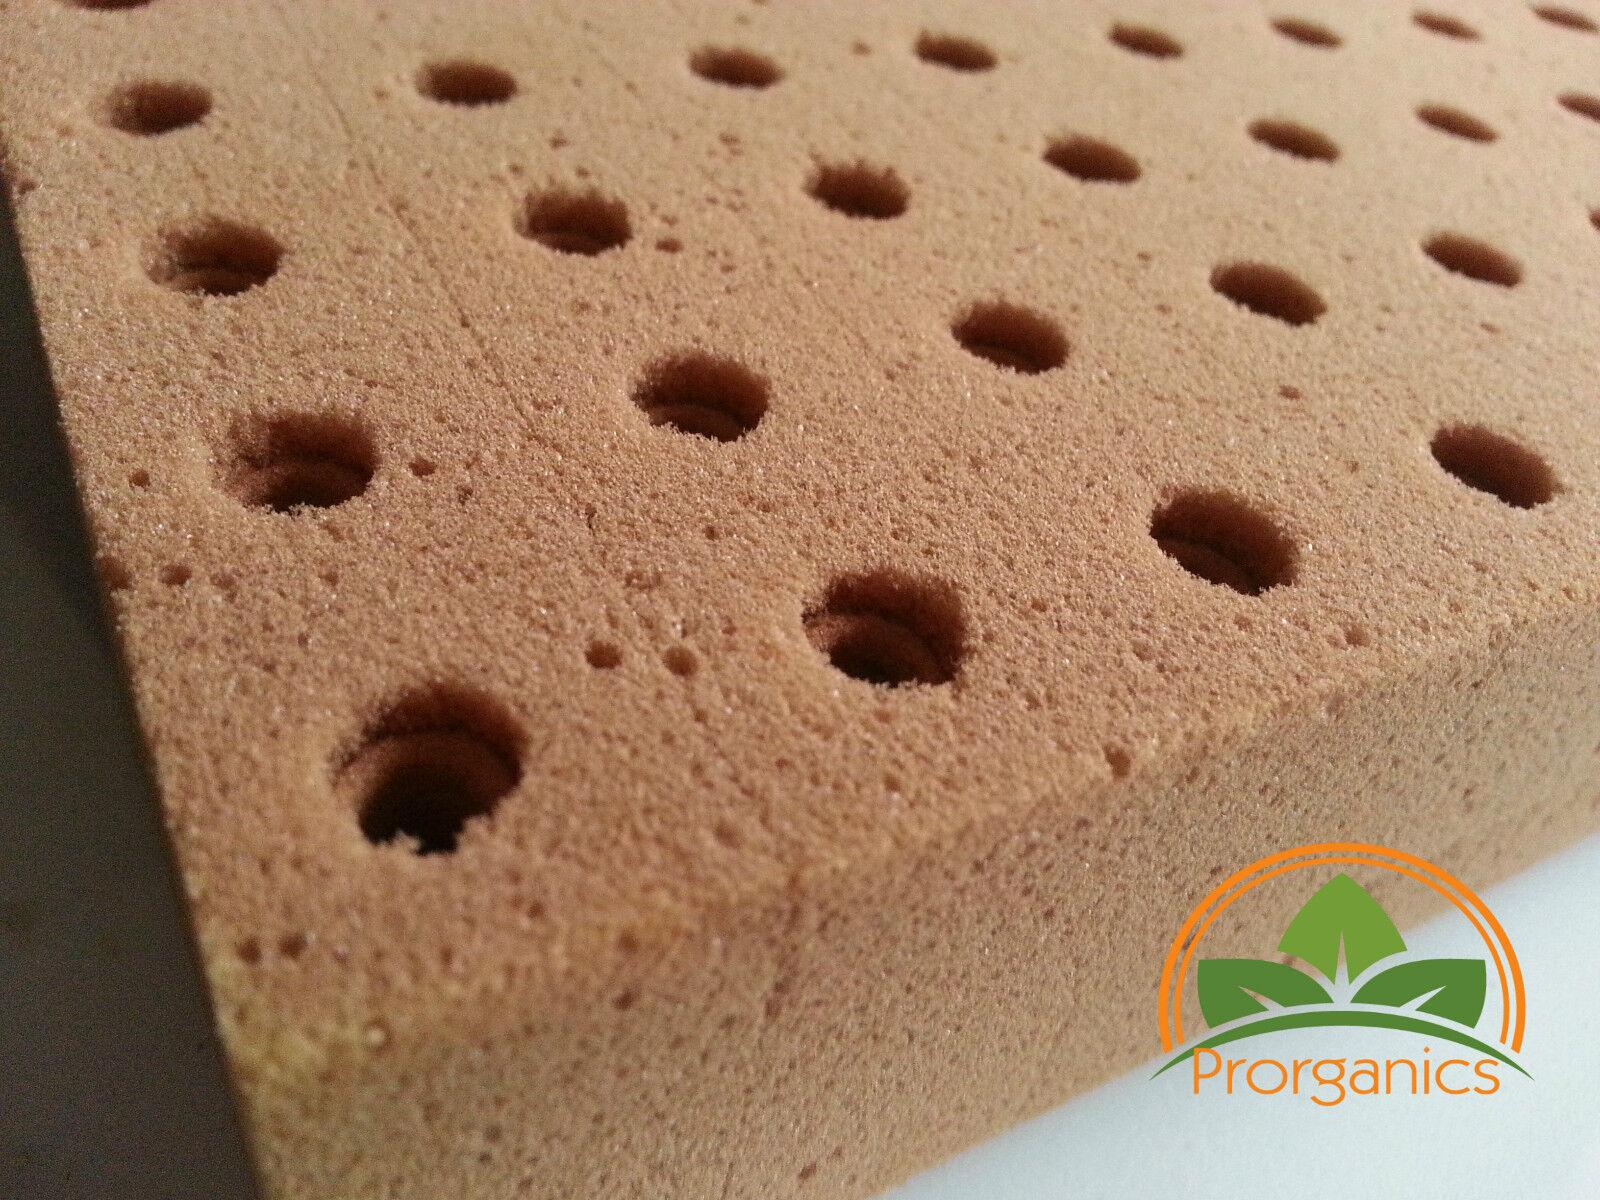 5520 hydroponics grow starter cubes by Prorganics